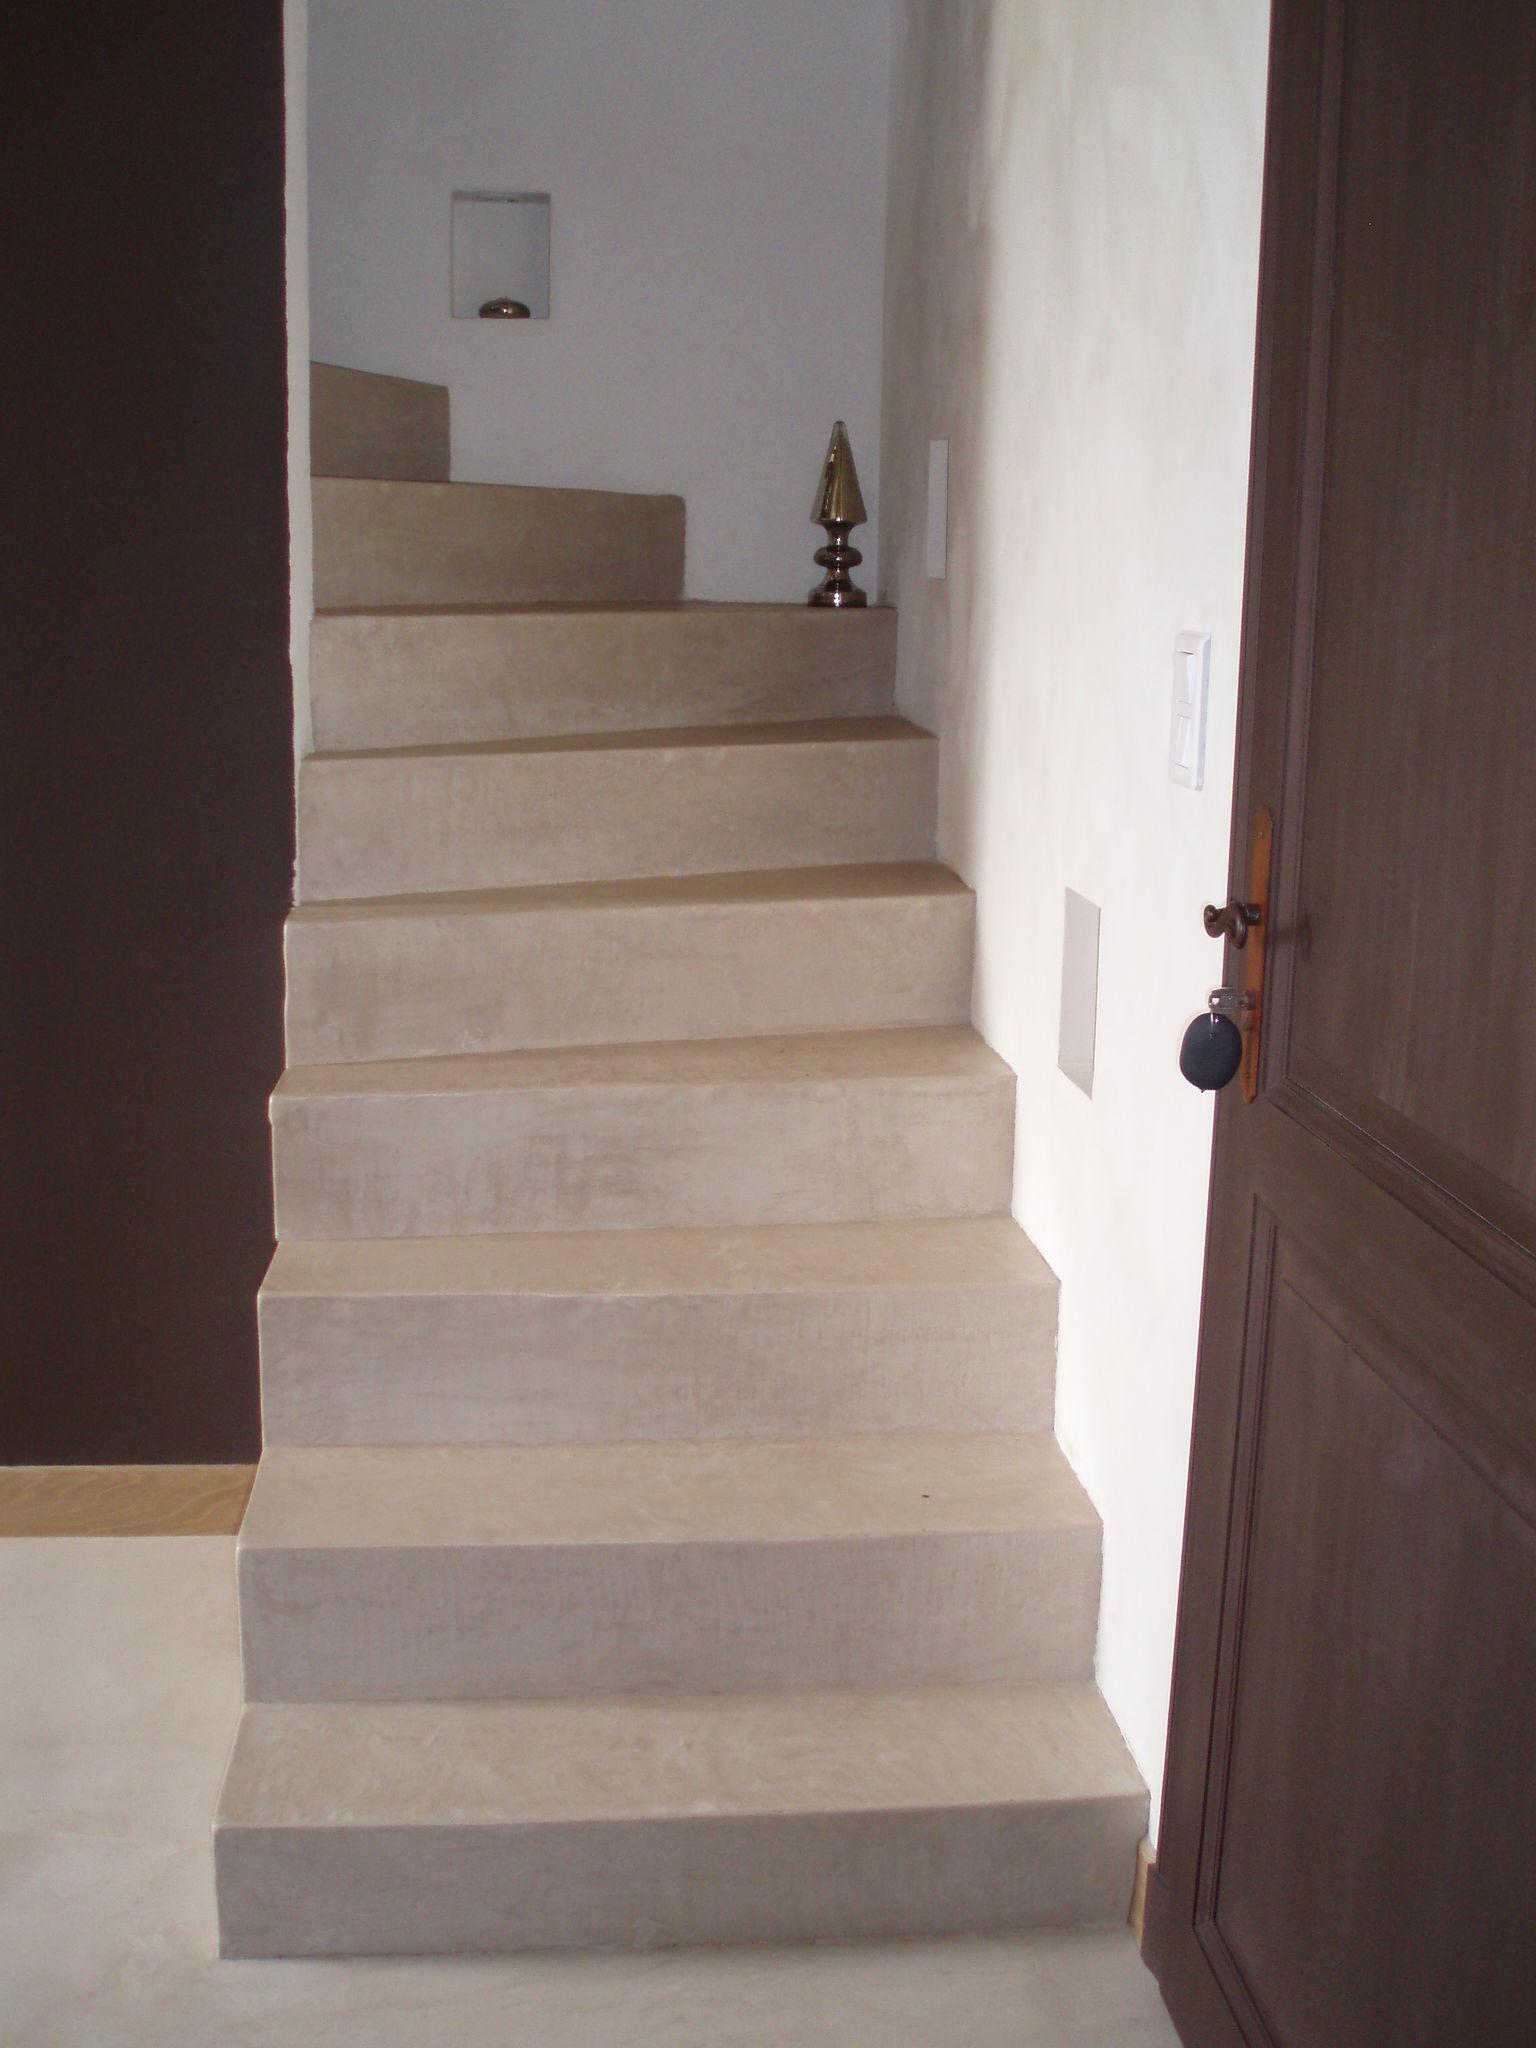 beton cire escalier photo de beton cire catherine pendanx. Black Bedroom Furniture Sets. Home Design Ideas